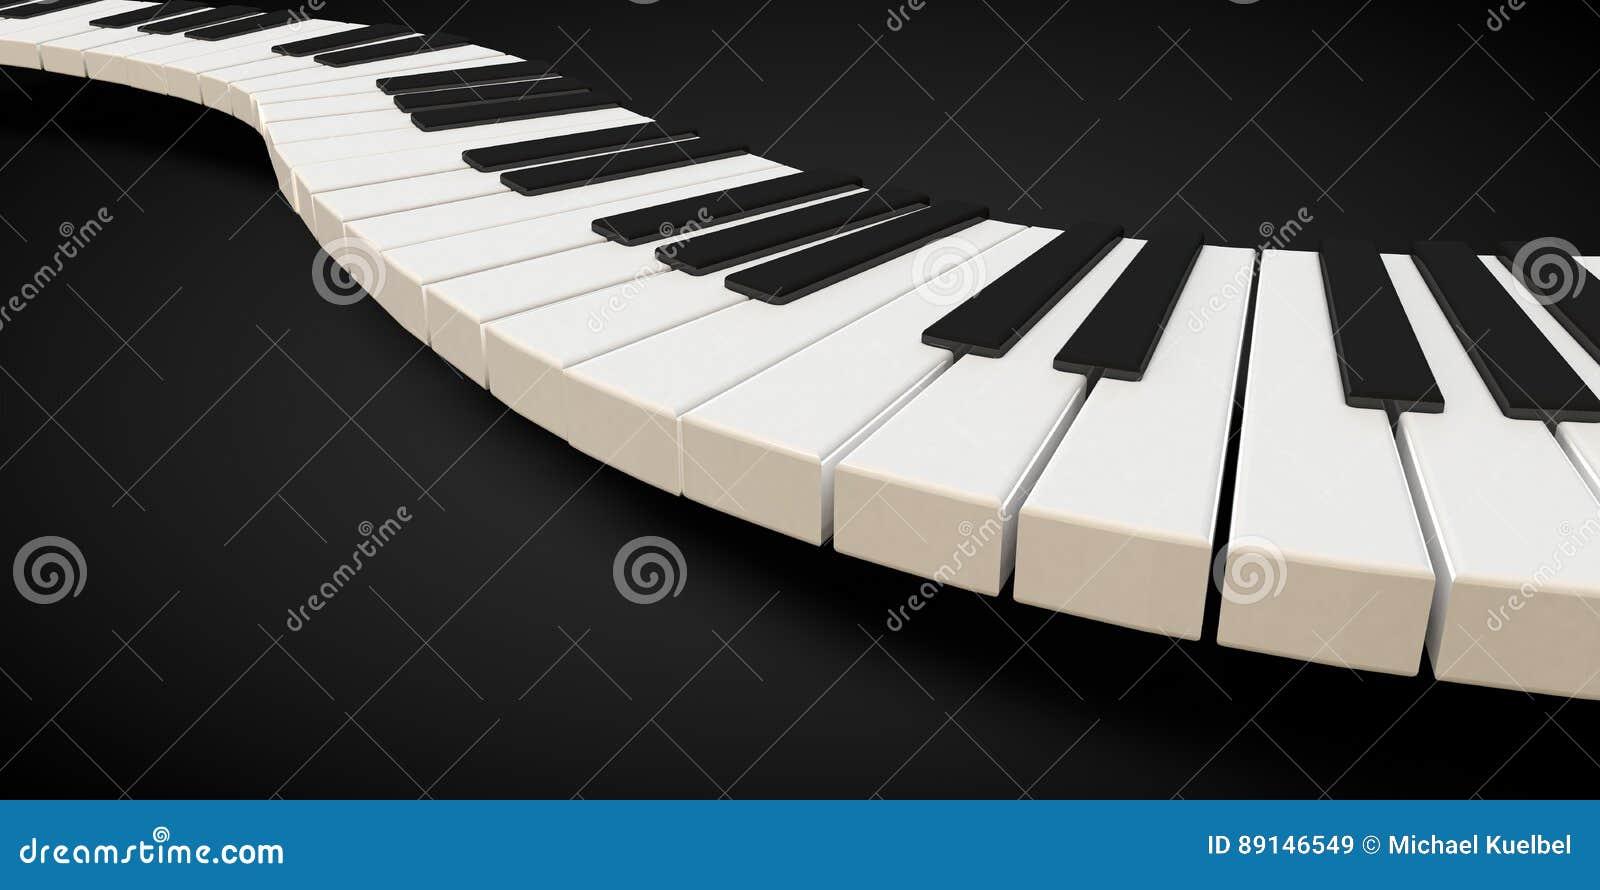 3d render of a piano keyboard in a fluid wavelike movement